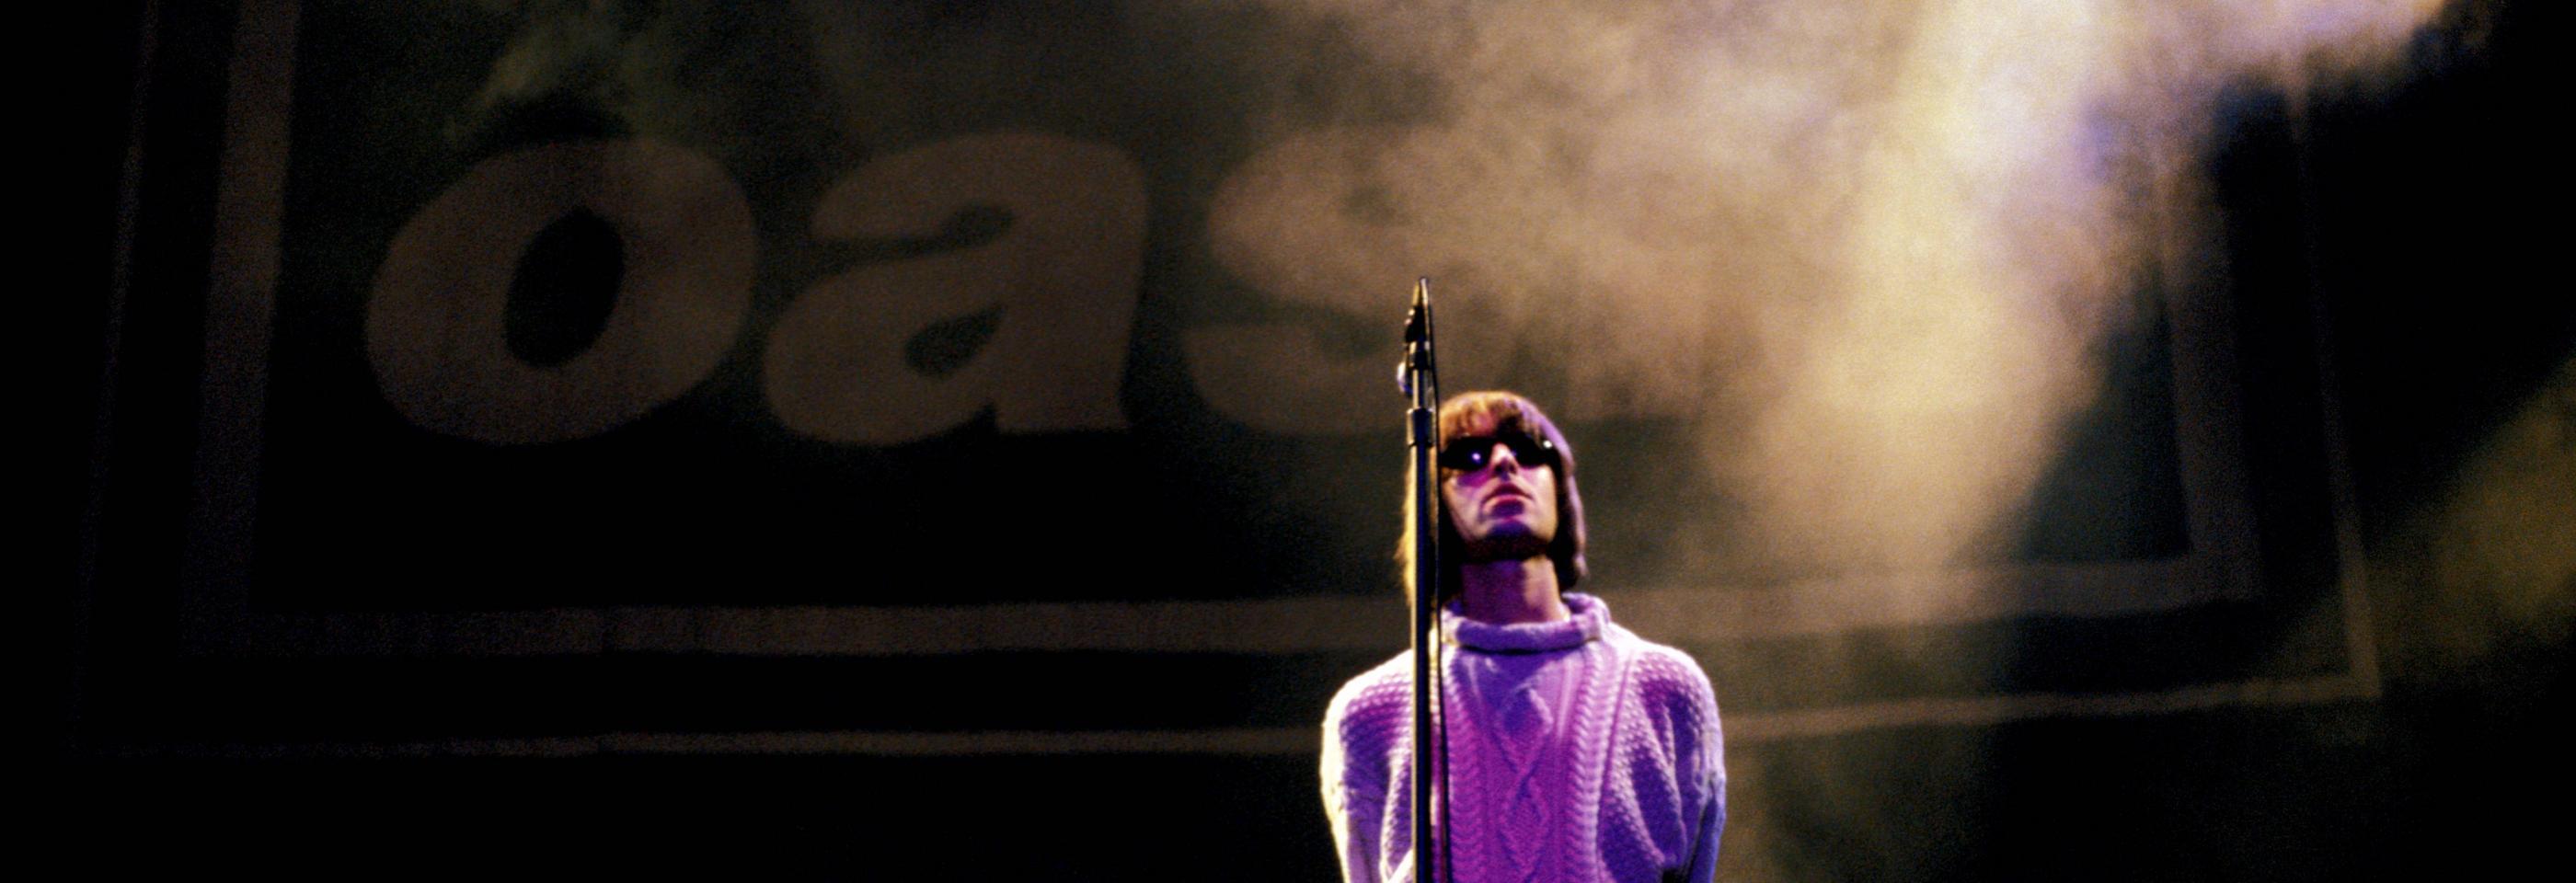 OASIS - Knebworth 1996 - Derby Days Out